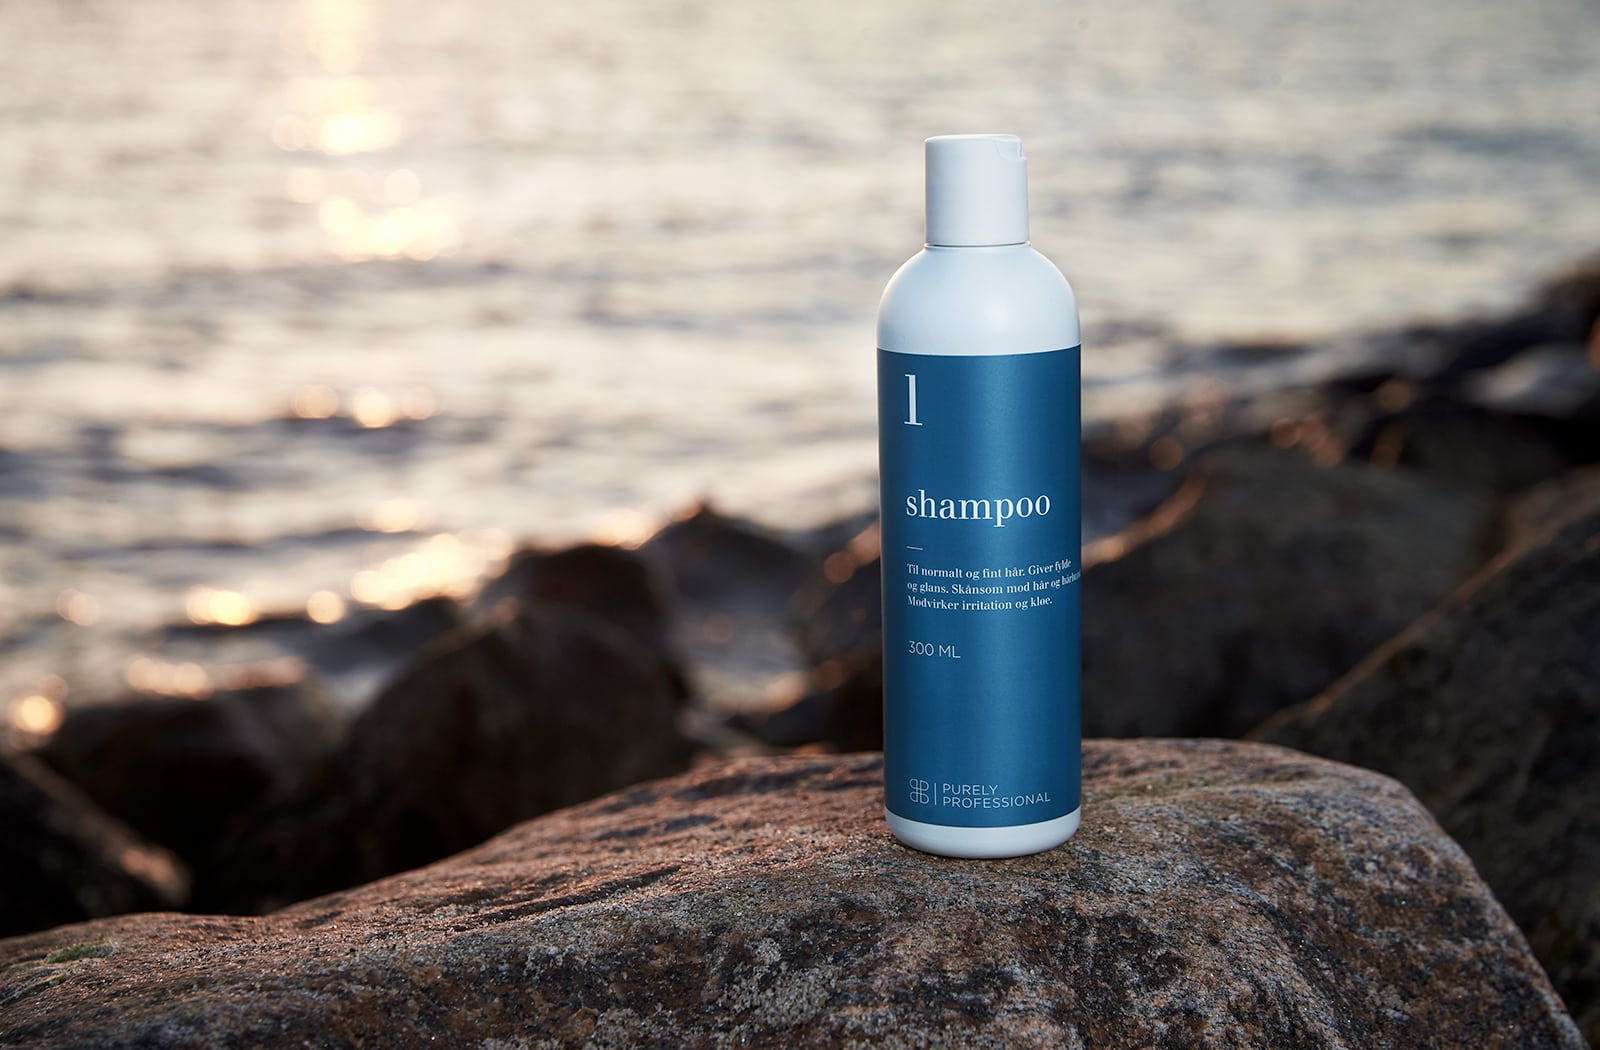 Shampoo 1 i genbrugsflaske